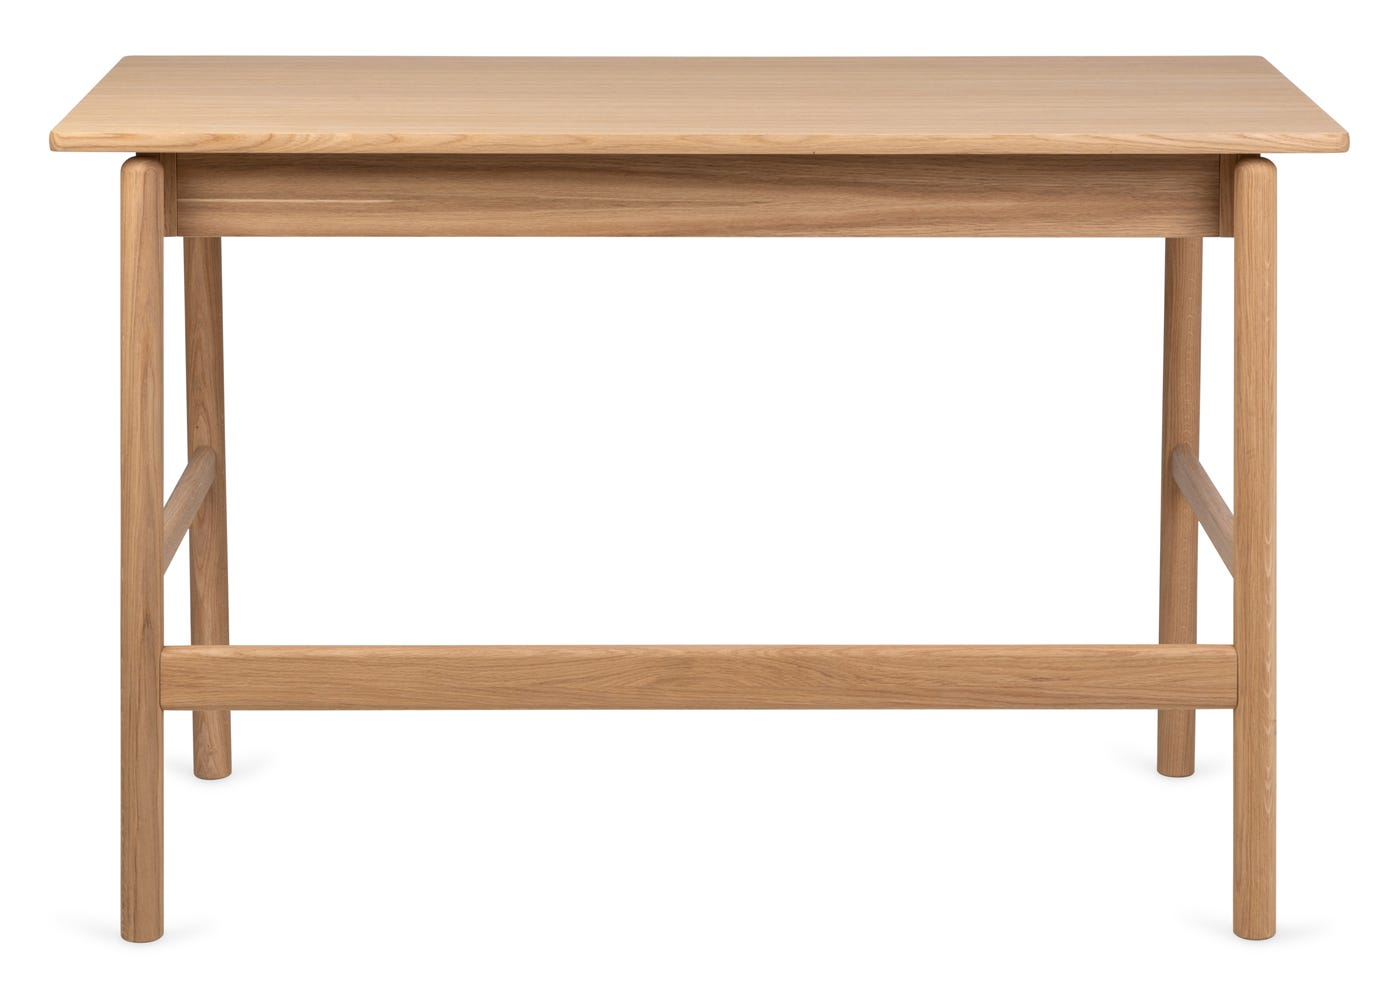 As shown: Flette desk - Rear profile.